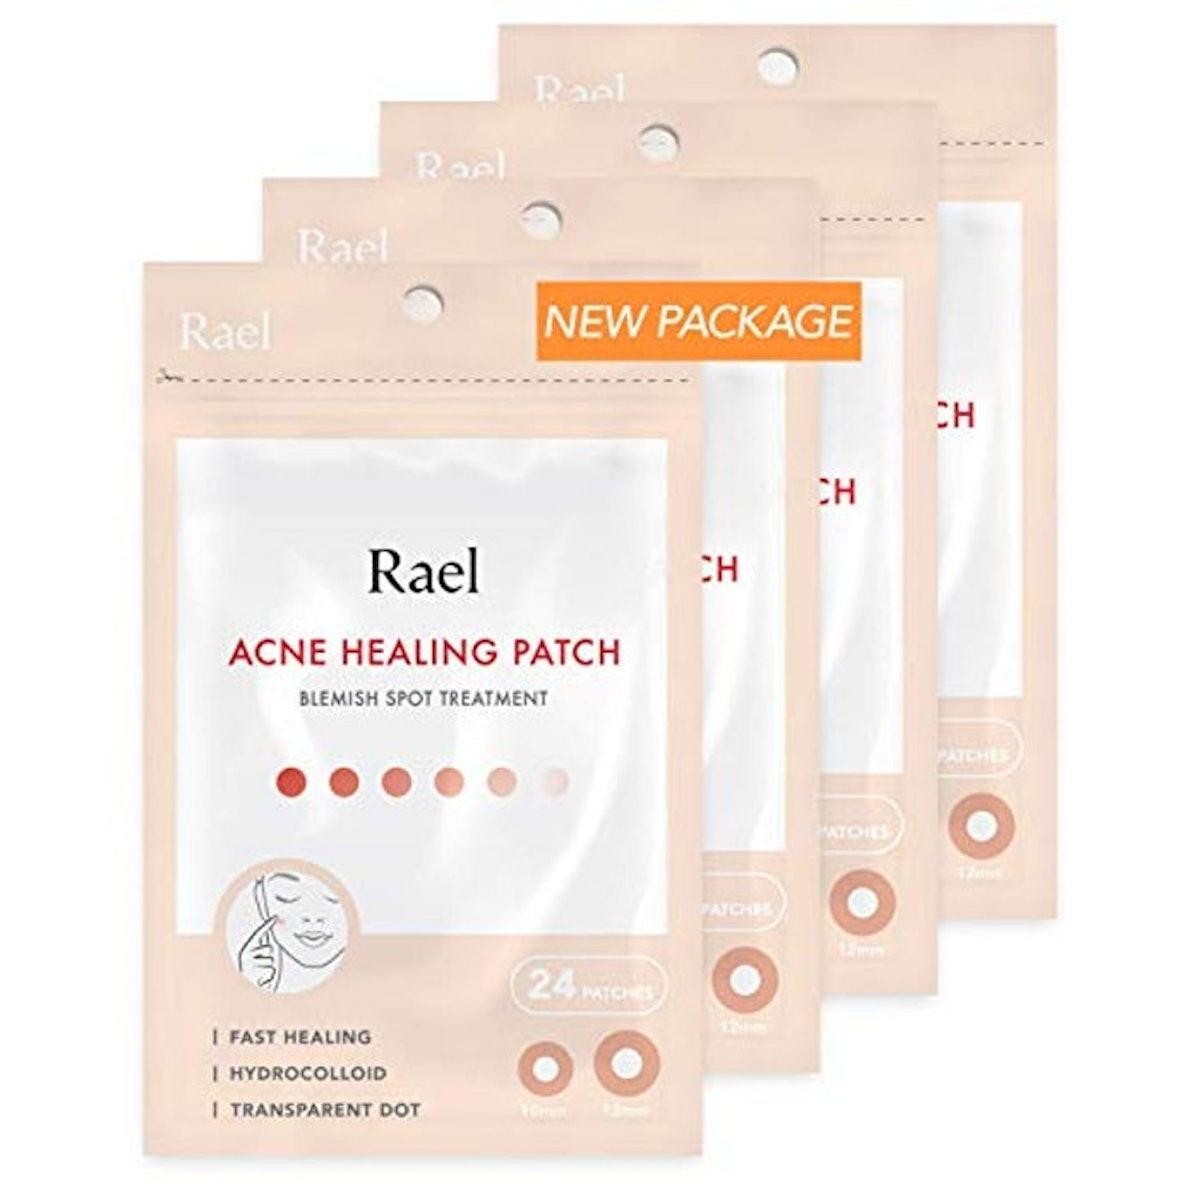 Rael Hydrocolloid Acne Healing Patch